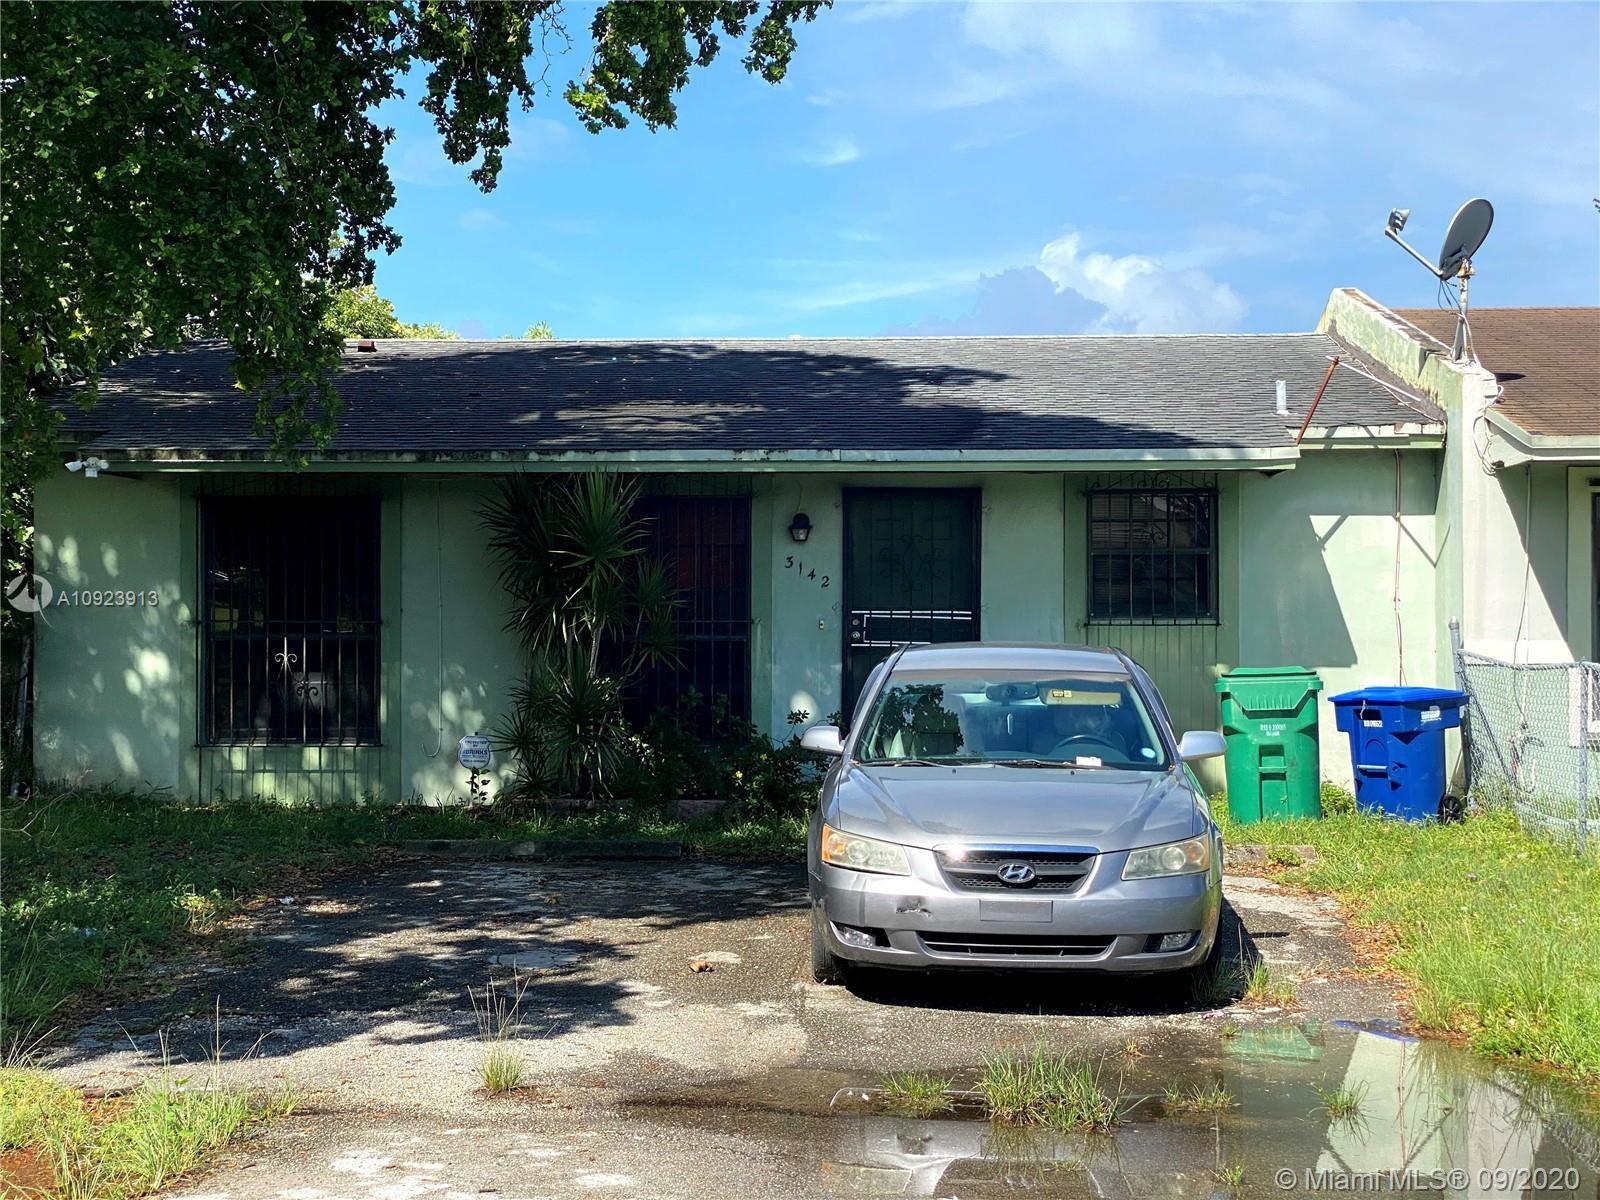 3142 NW 196th St #3142, Miami Gardens, FL 33056 - #: A10923913